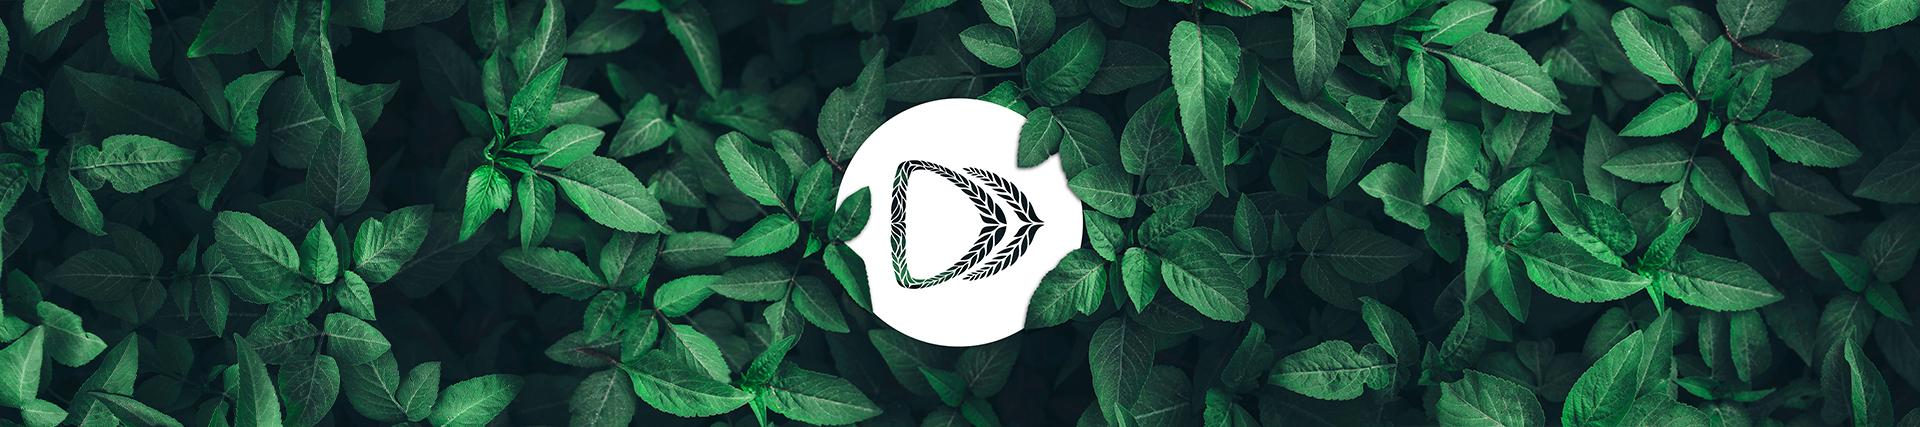 Sustainable blog 2